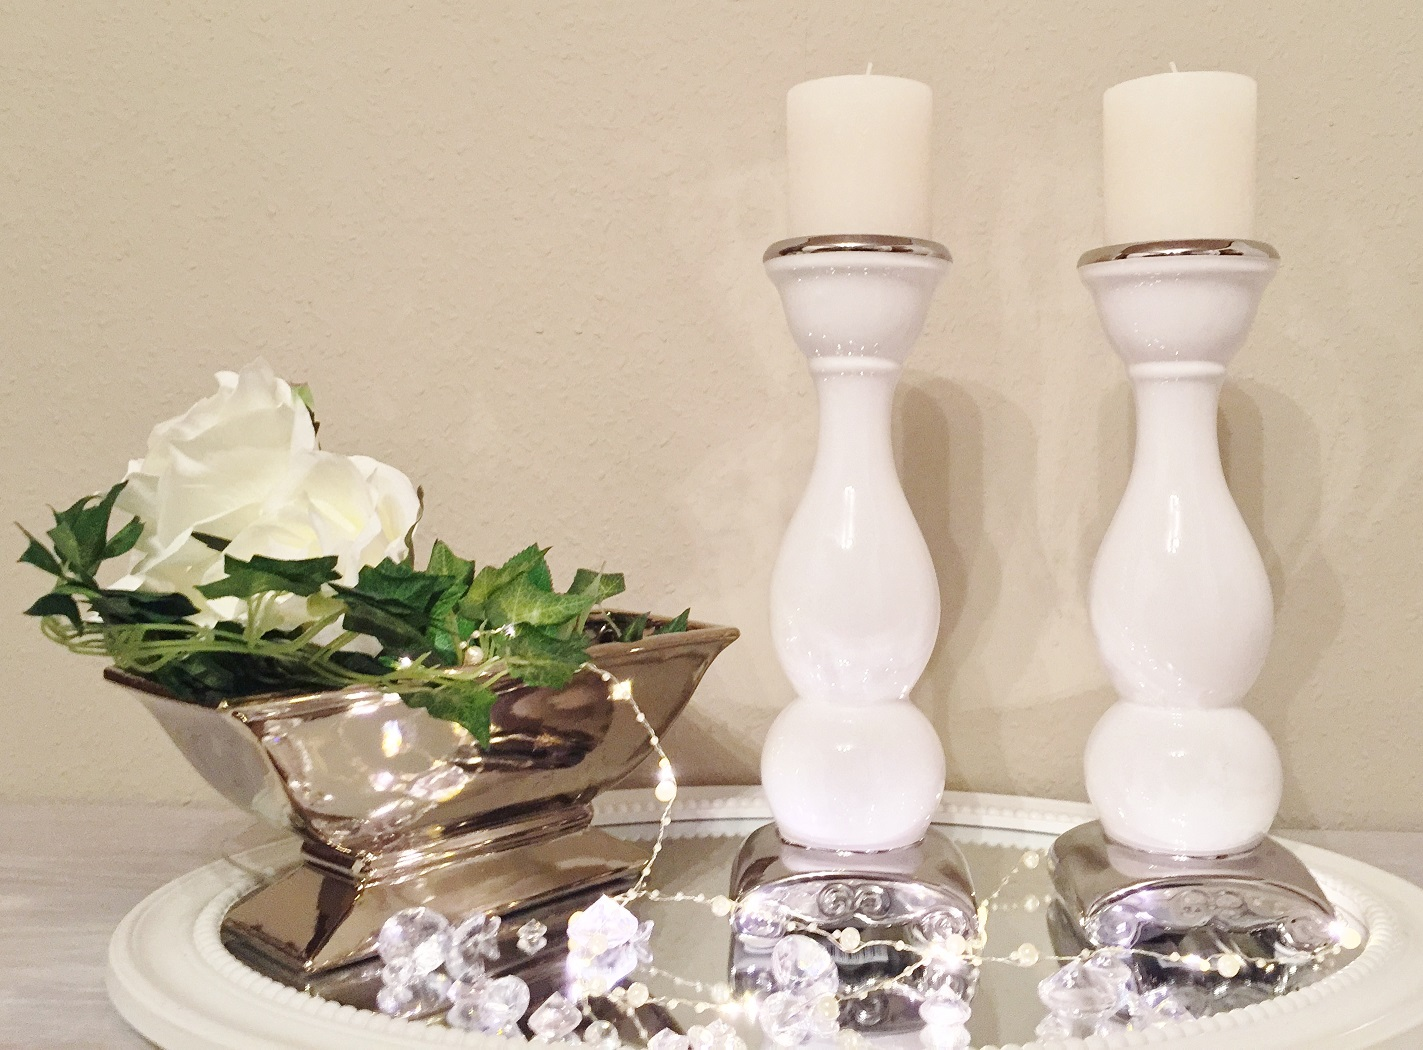 2 x 39 cm keramik kerzenst nder wei silber keramik. Black Bedroom Furniture Sets. Home Design Ideas